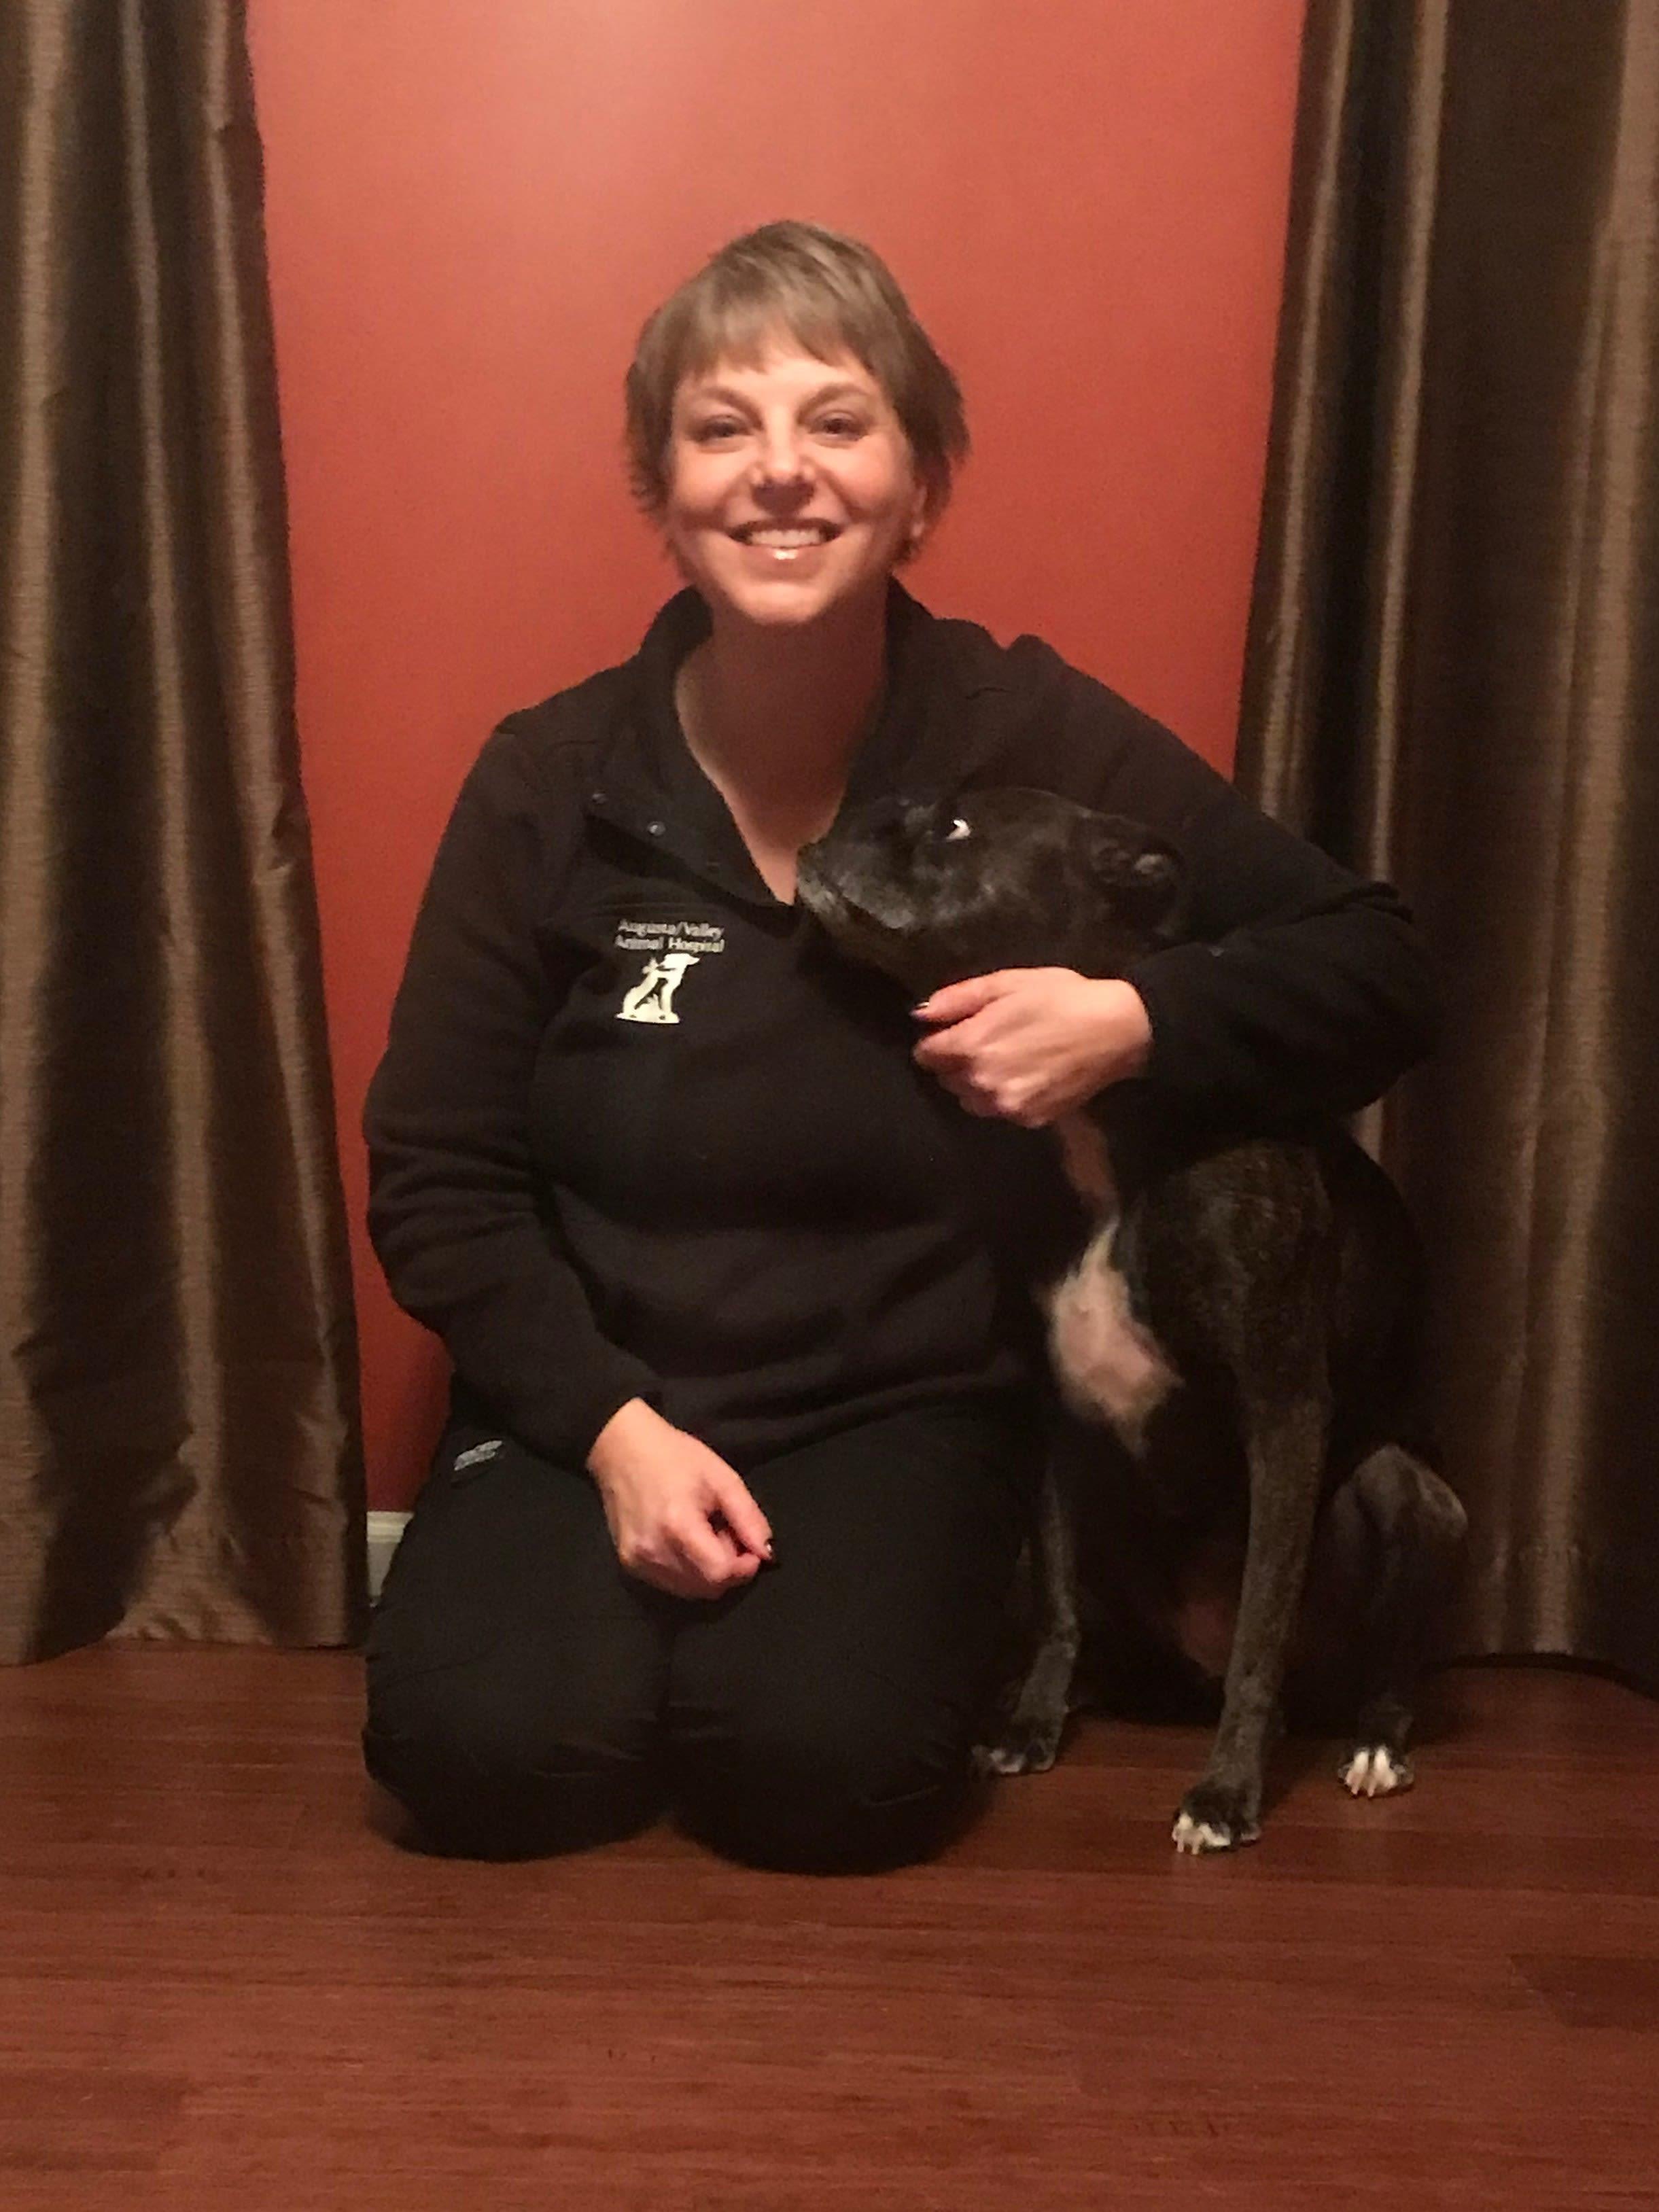 Amy, Receptionist at Staunton Animal Hospital